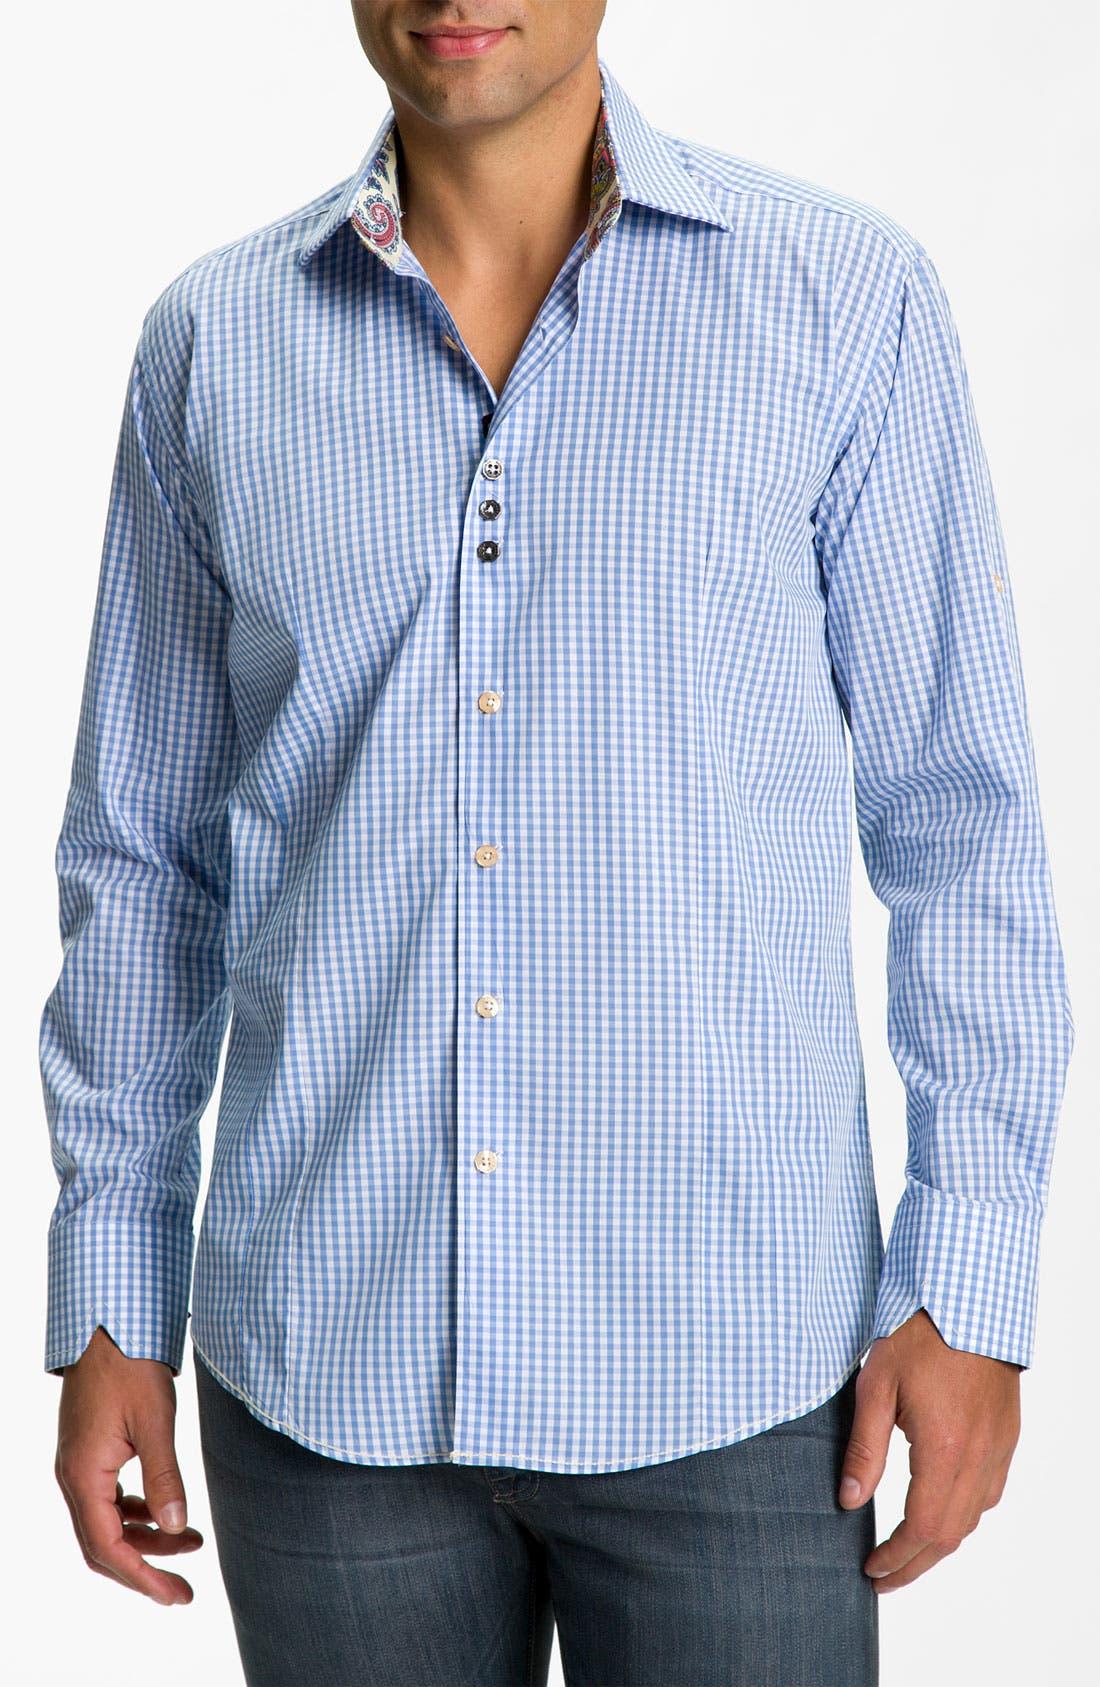 Alternate Image 1 Selected - Bogosse Trim Fit Sport Shirt